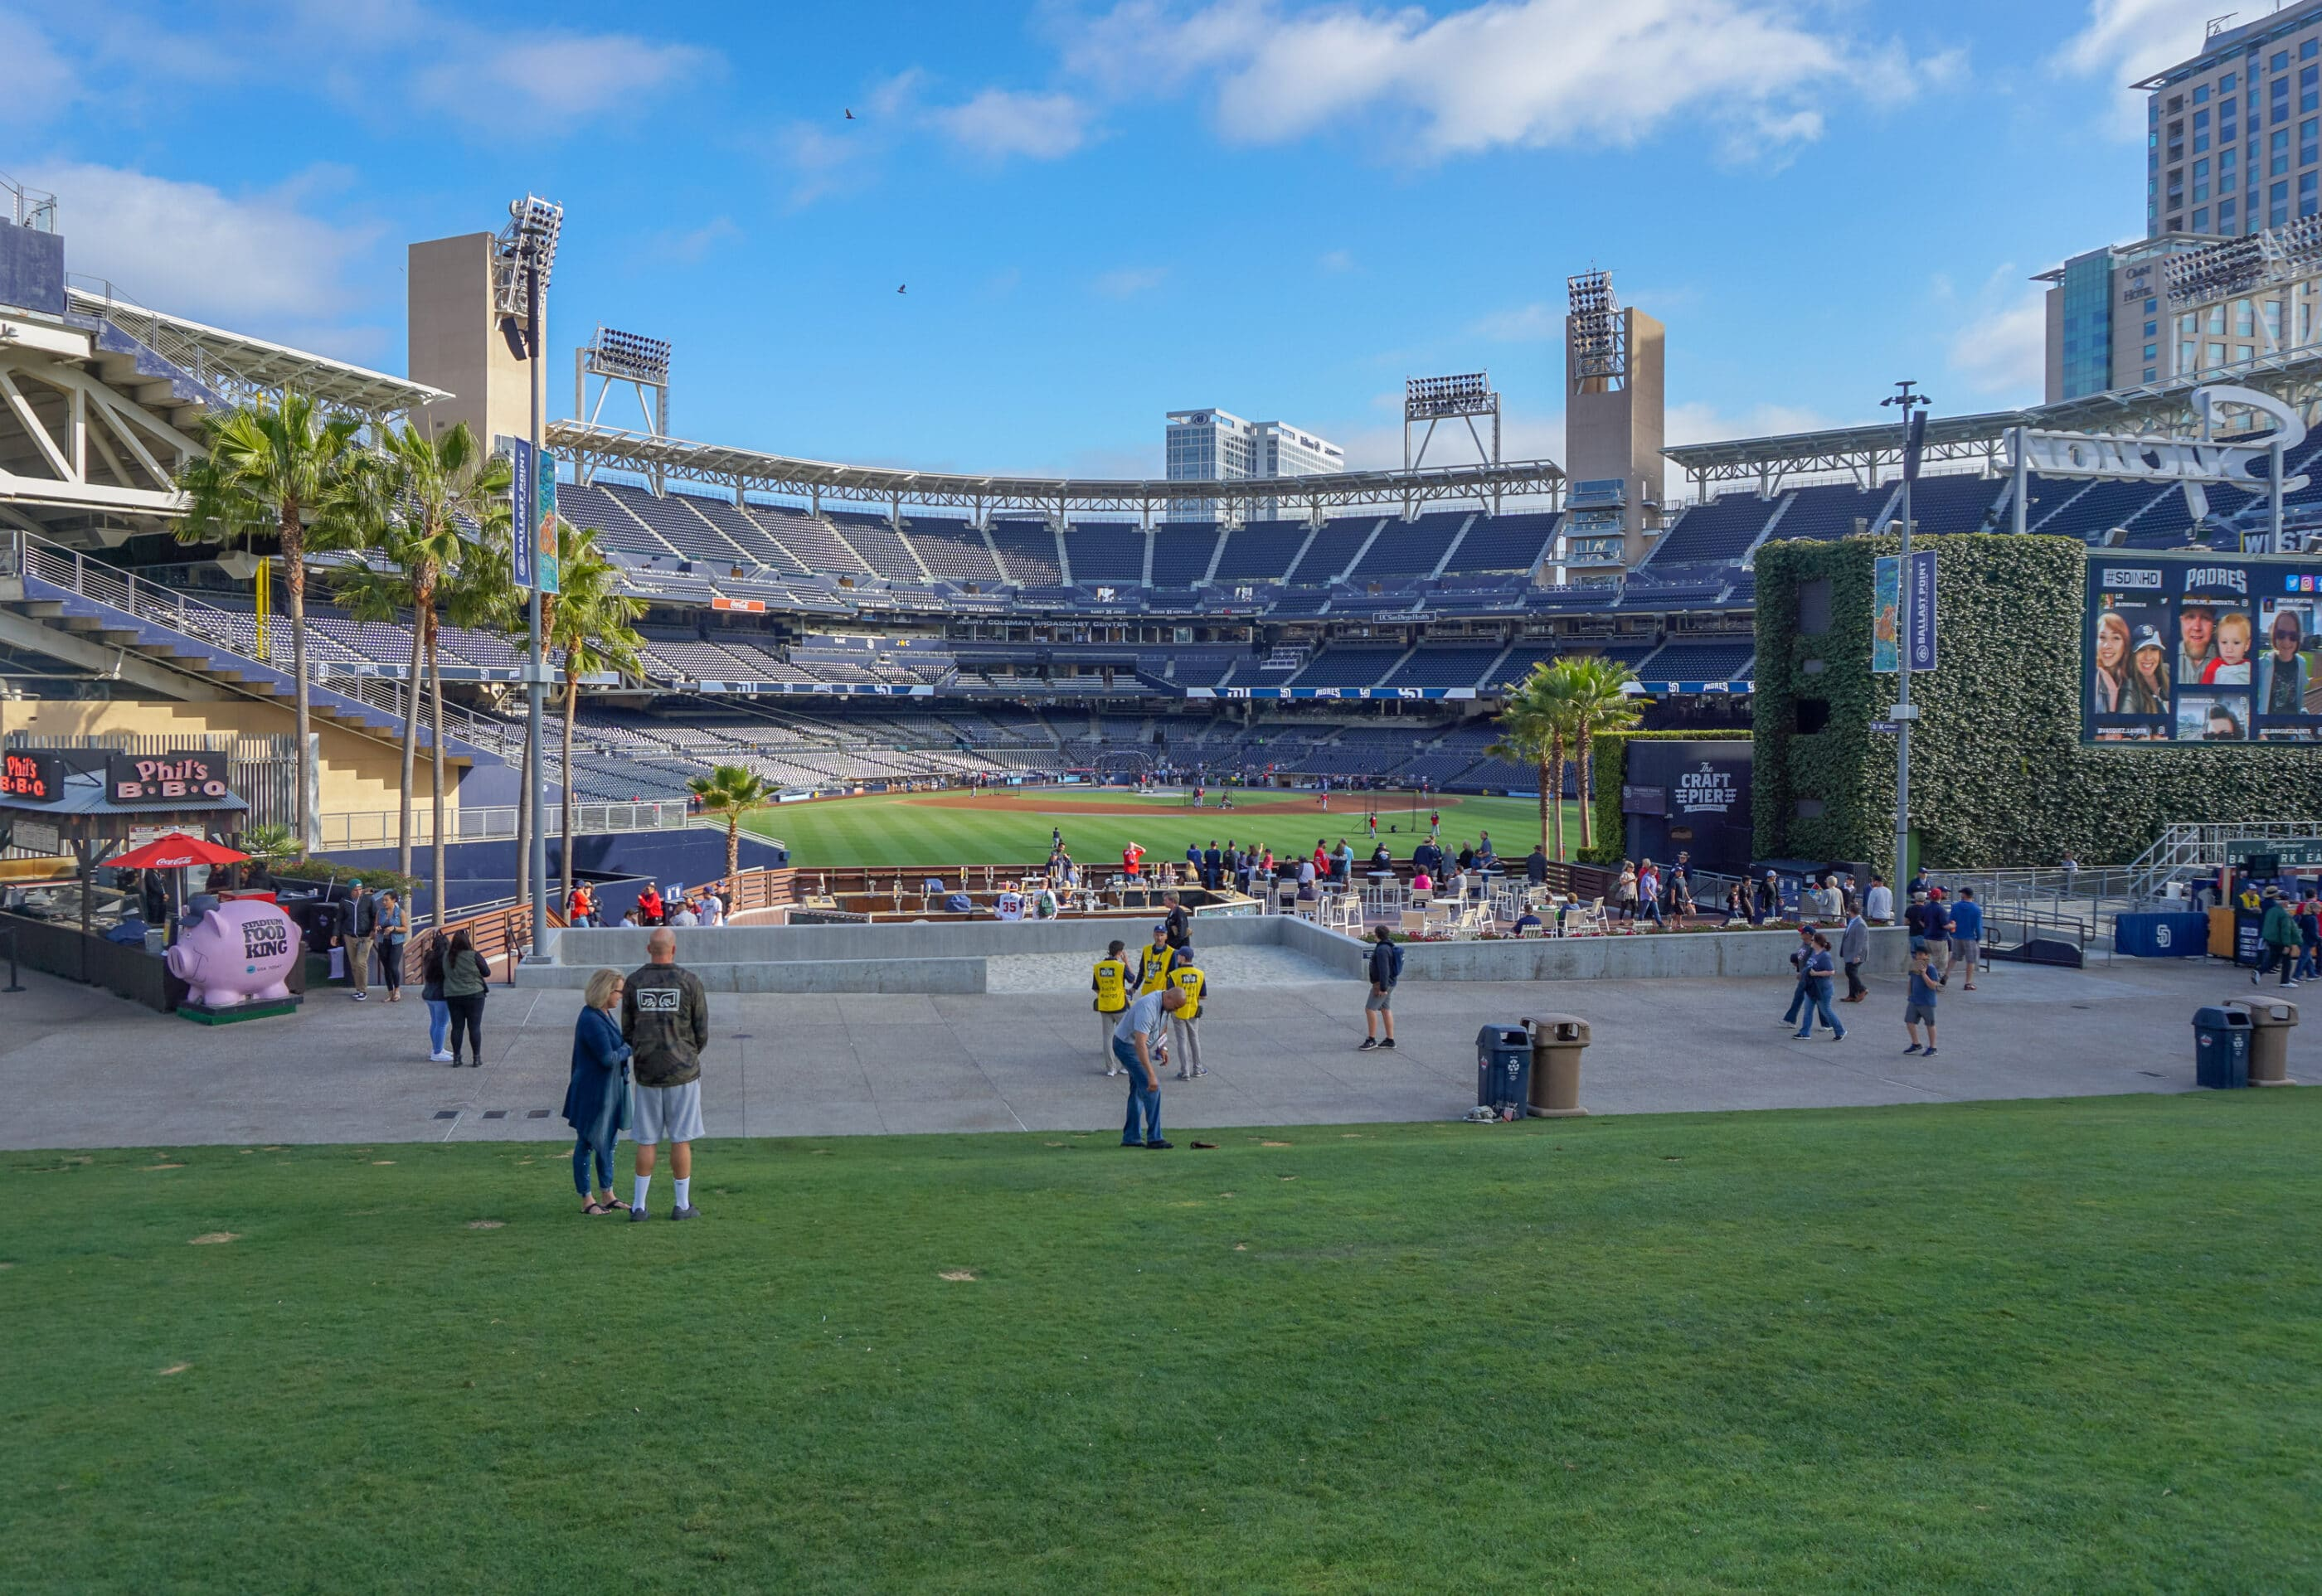 People enjoy PETCO Park before a Padres game in San Diego.